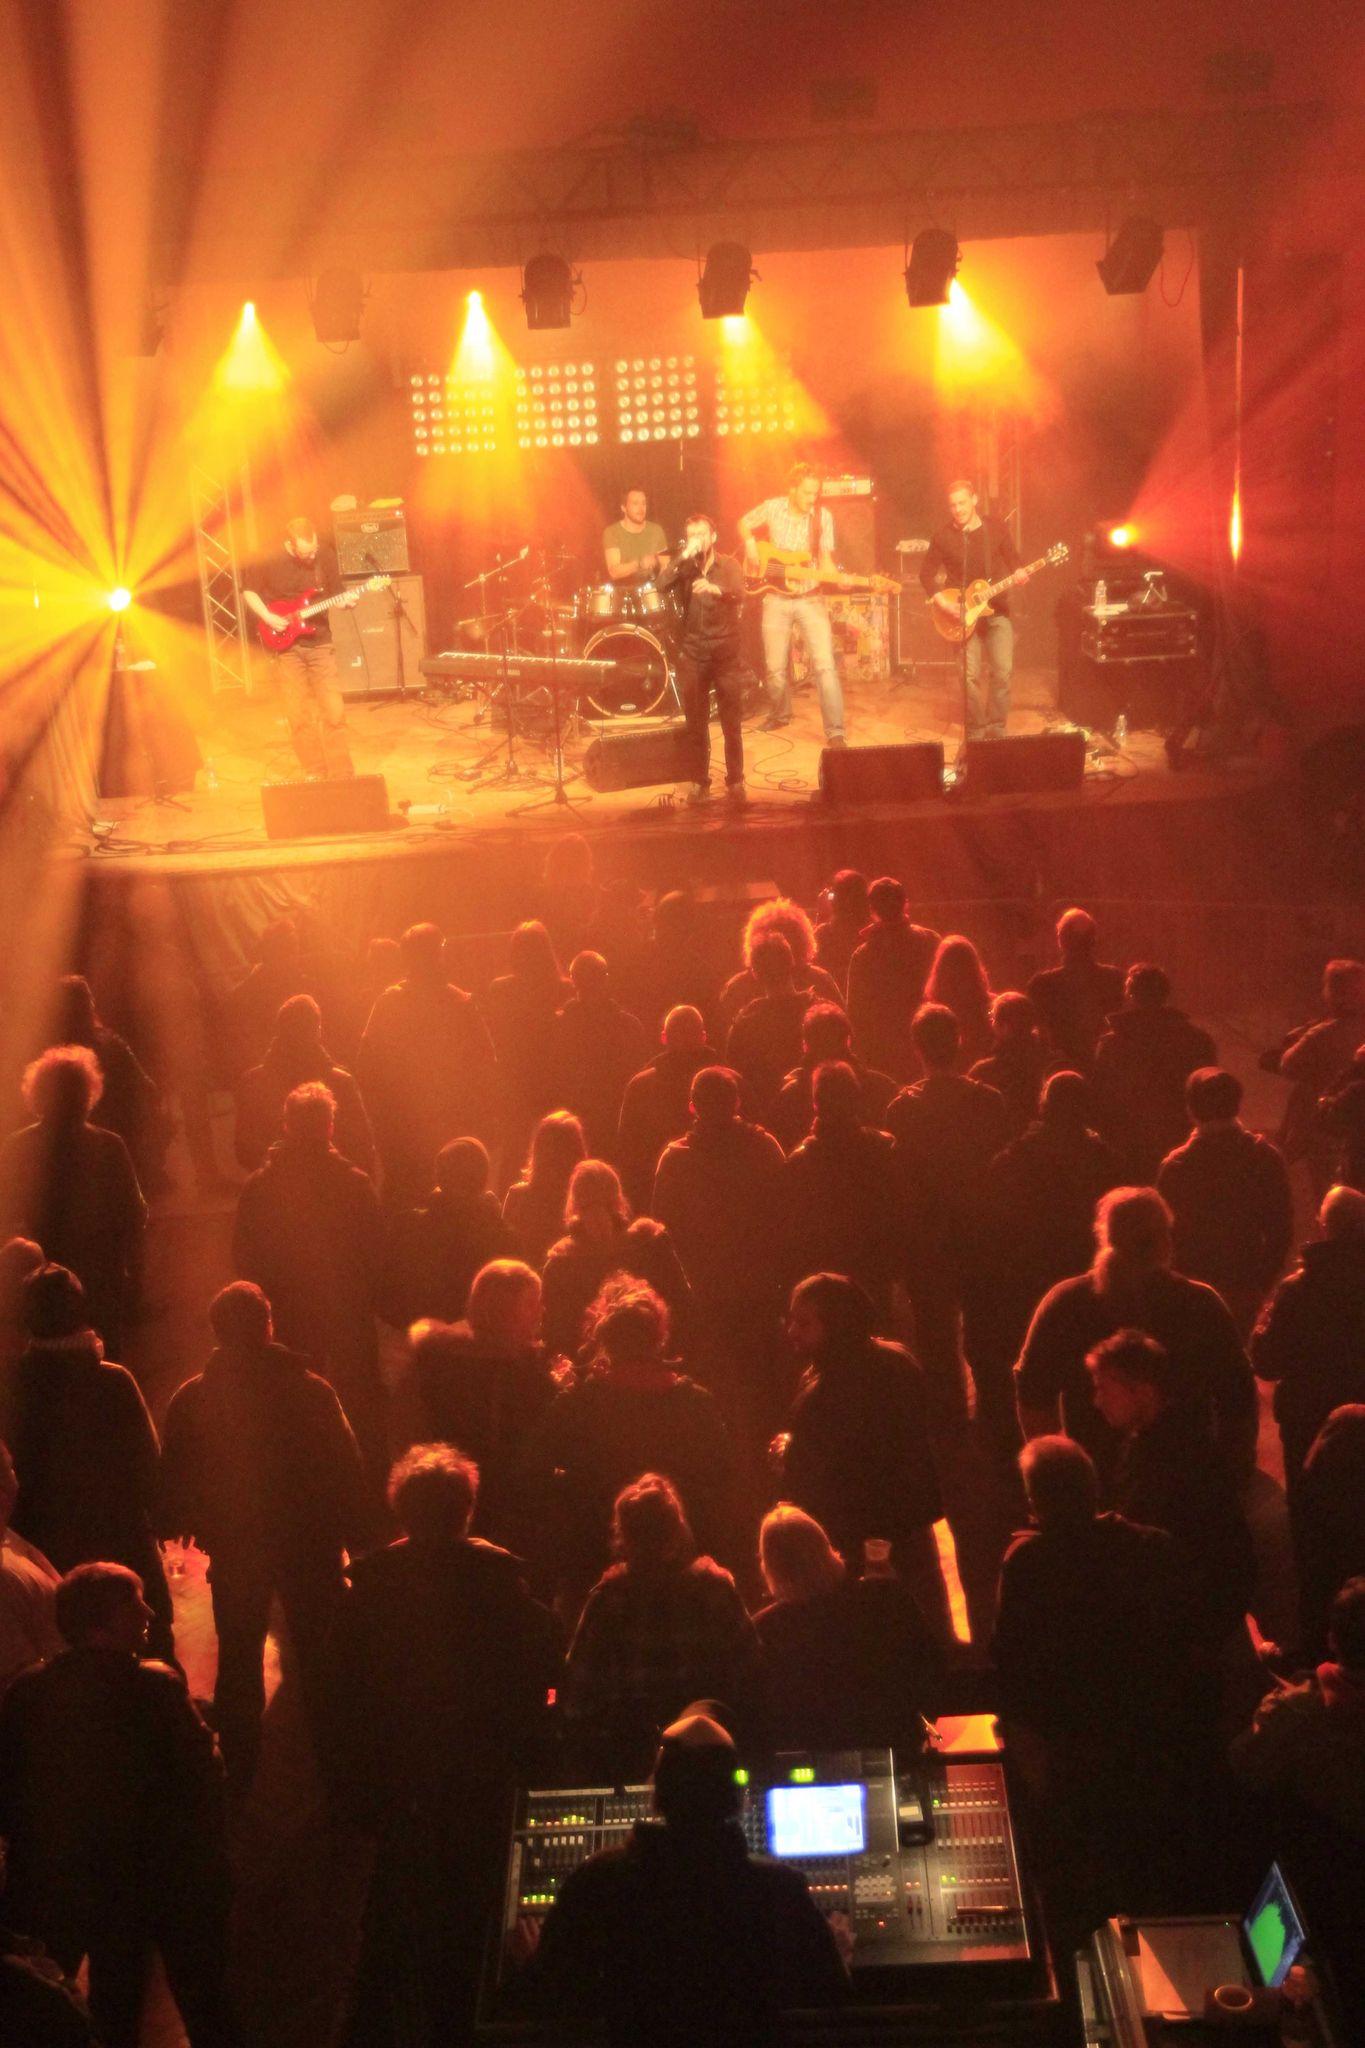 Ambiance-GrandBazarFestival-LeNouvion-2013-188